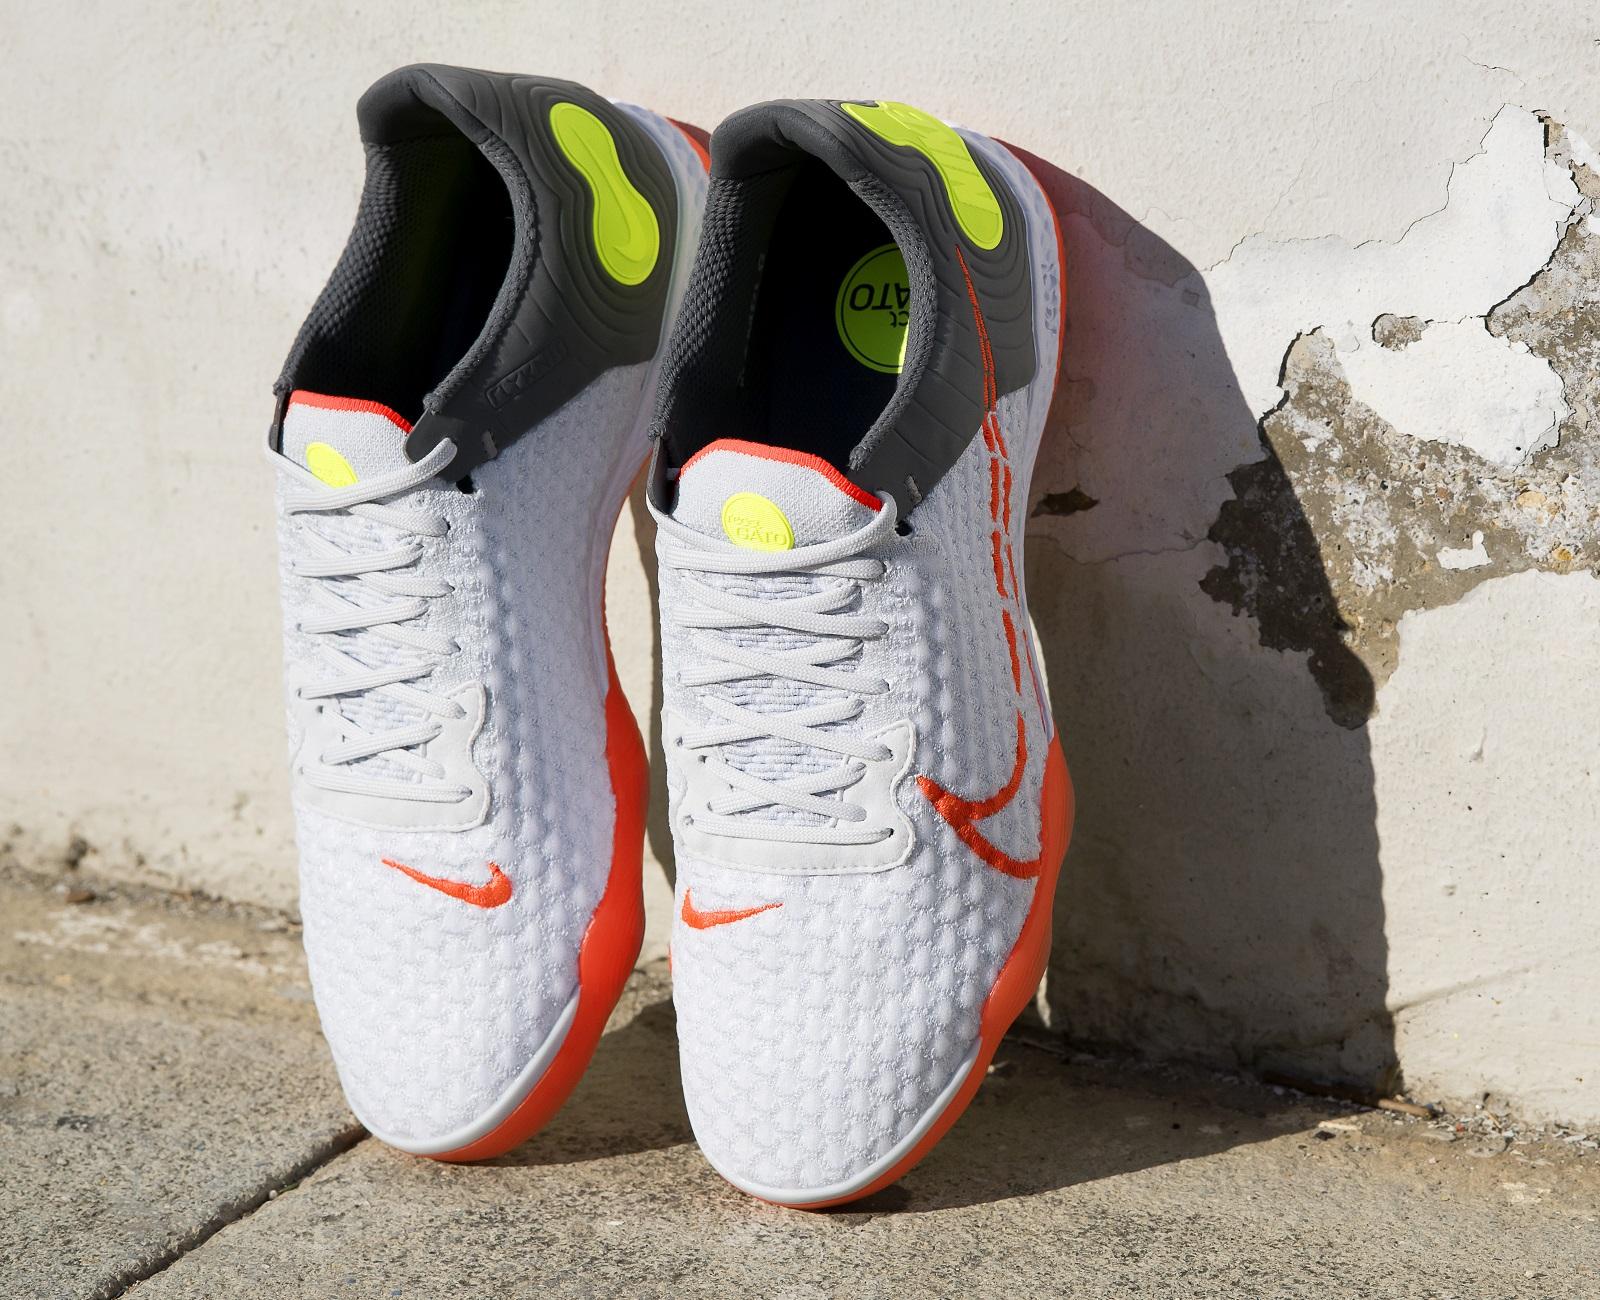 Nike React Gato Futsal Shoes | Soccer Cleats 101